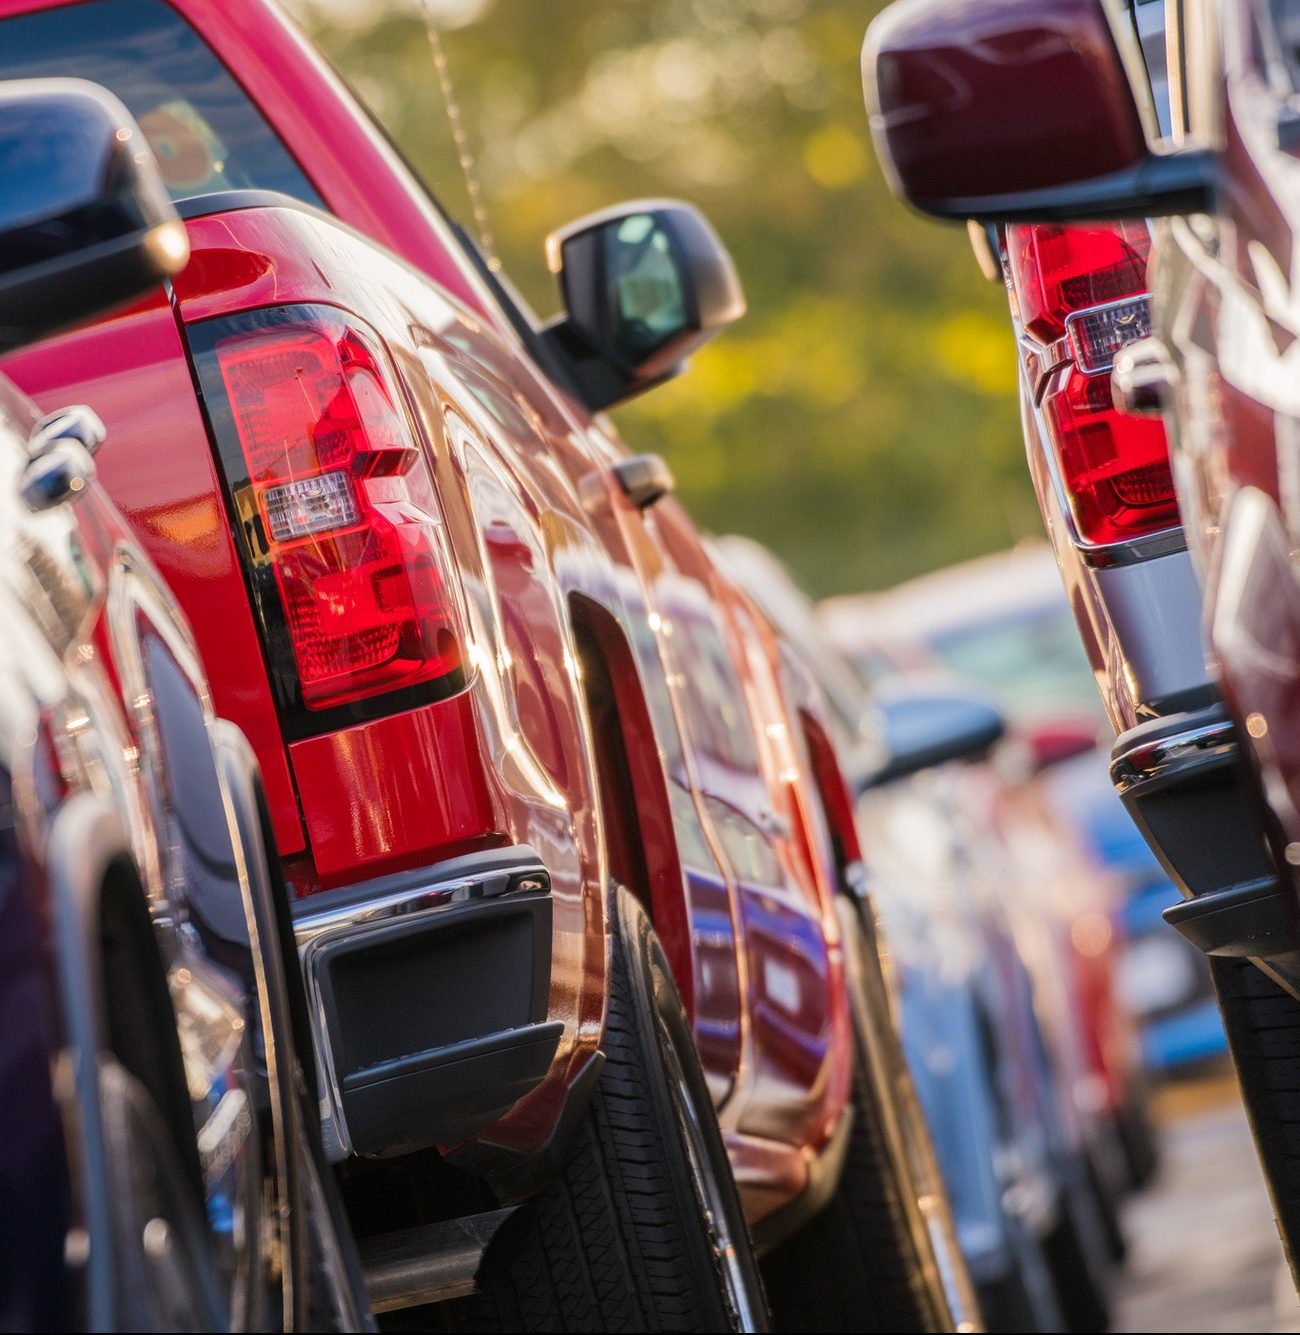 Parking Full of Cars